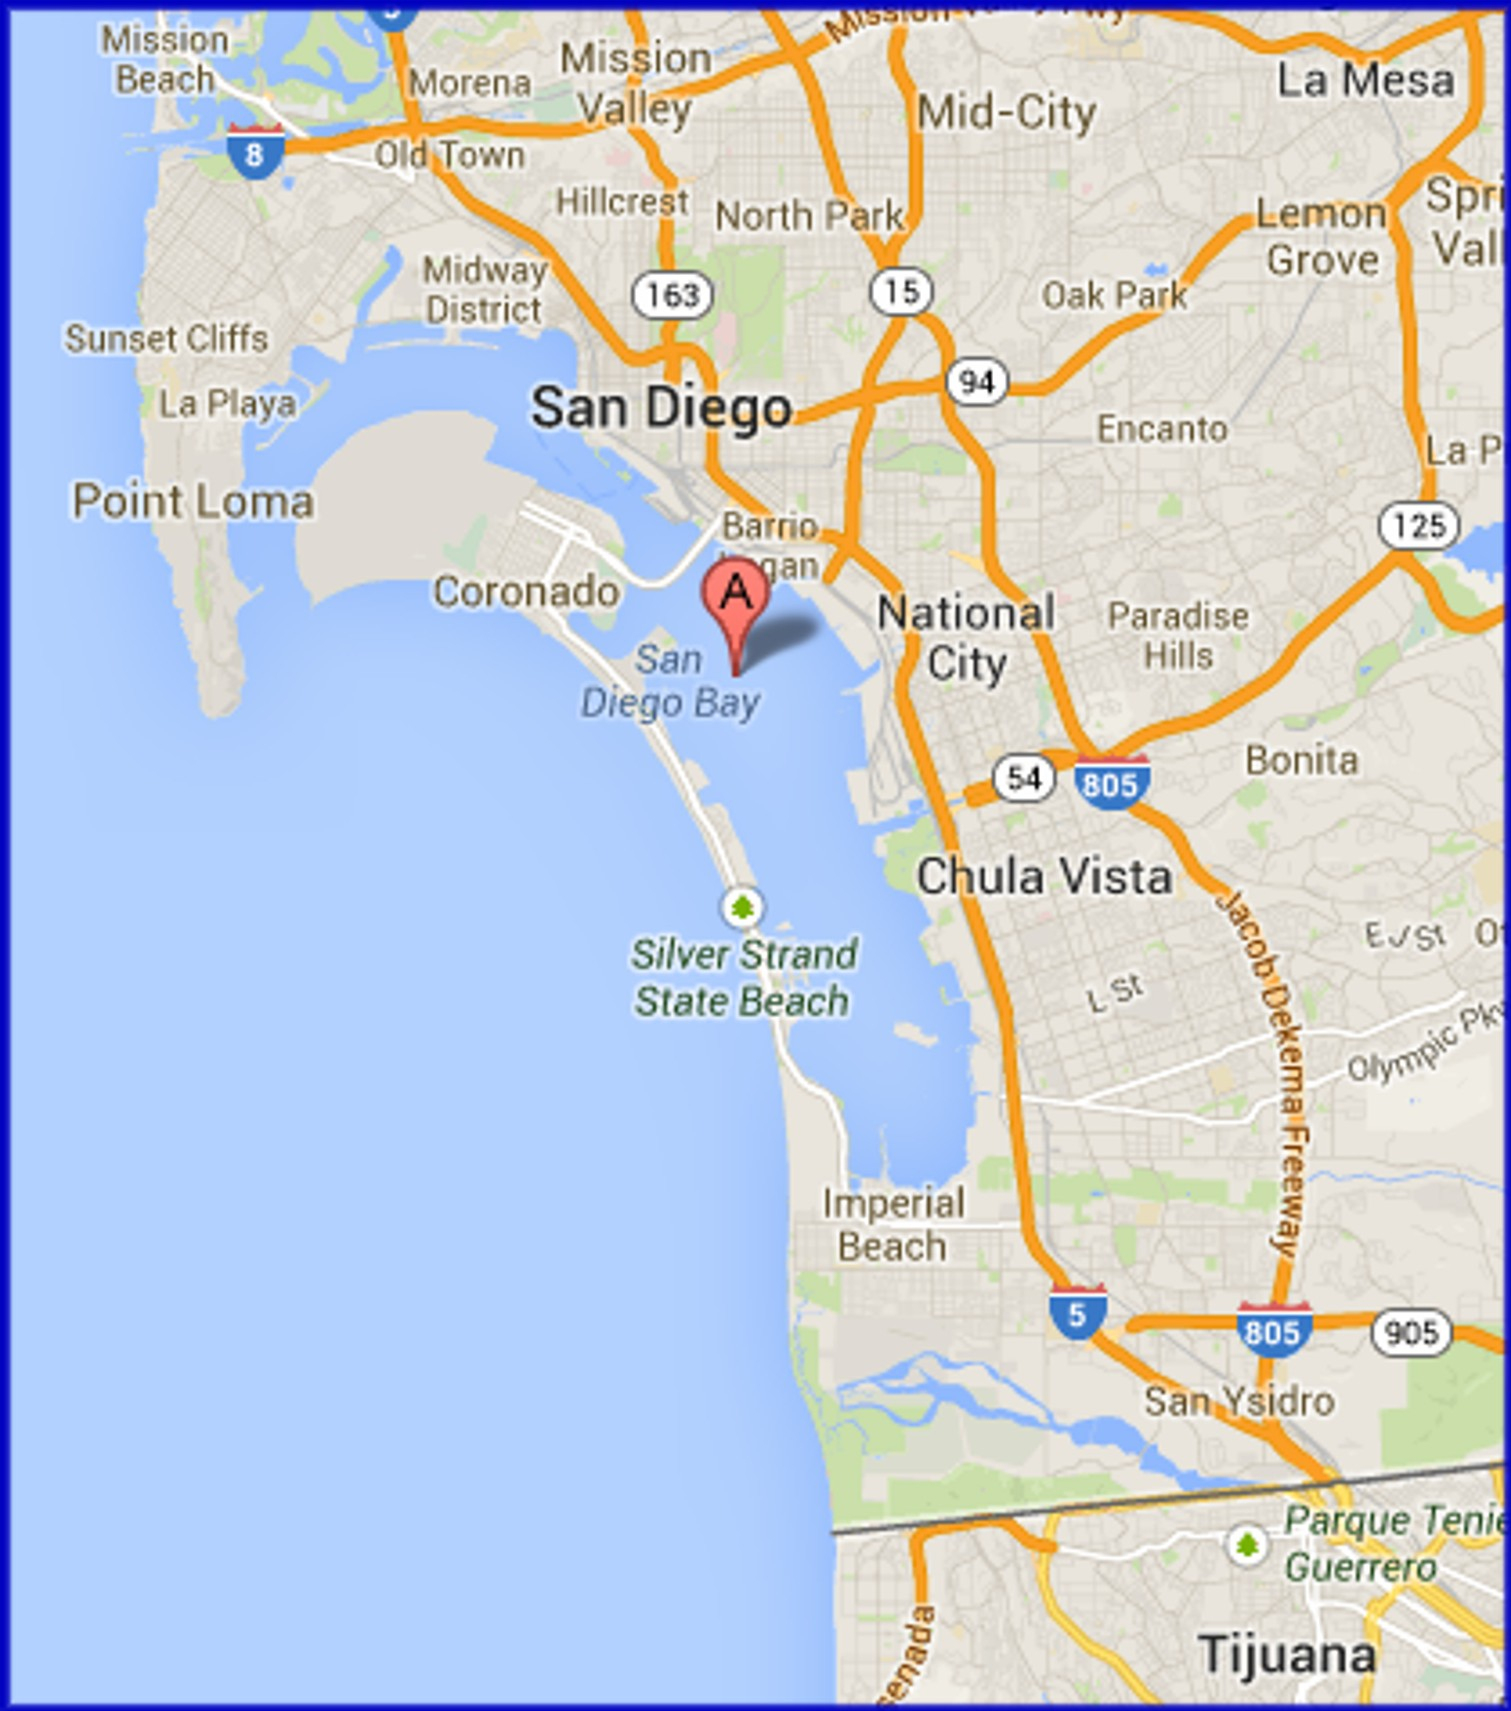 Cities Communities Neig Map Of California Springs San Diego - City Map Of San Diego California